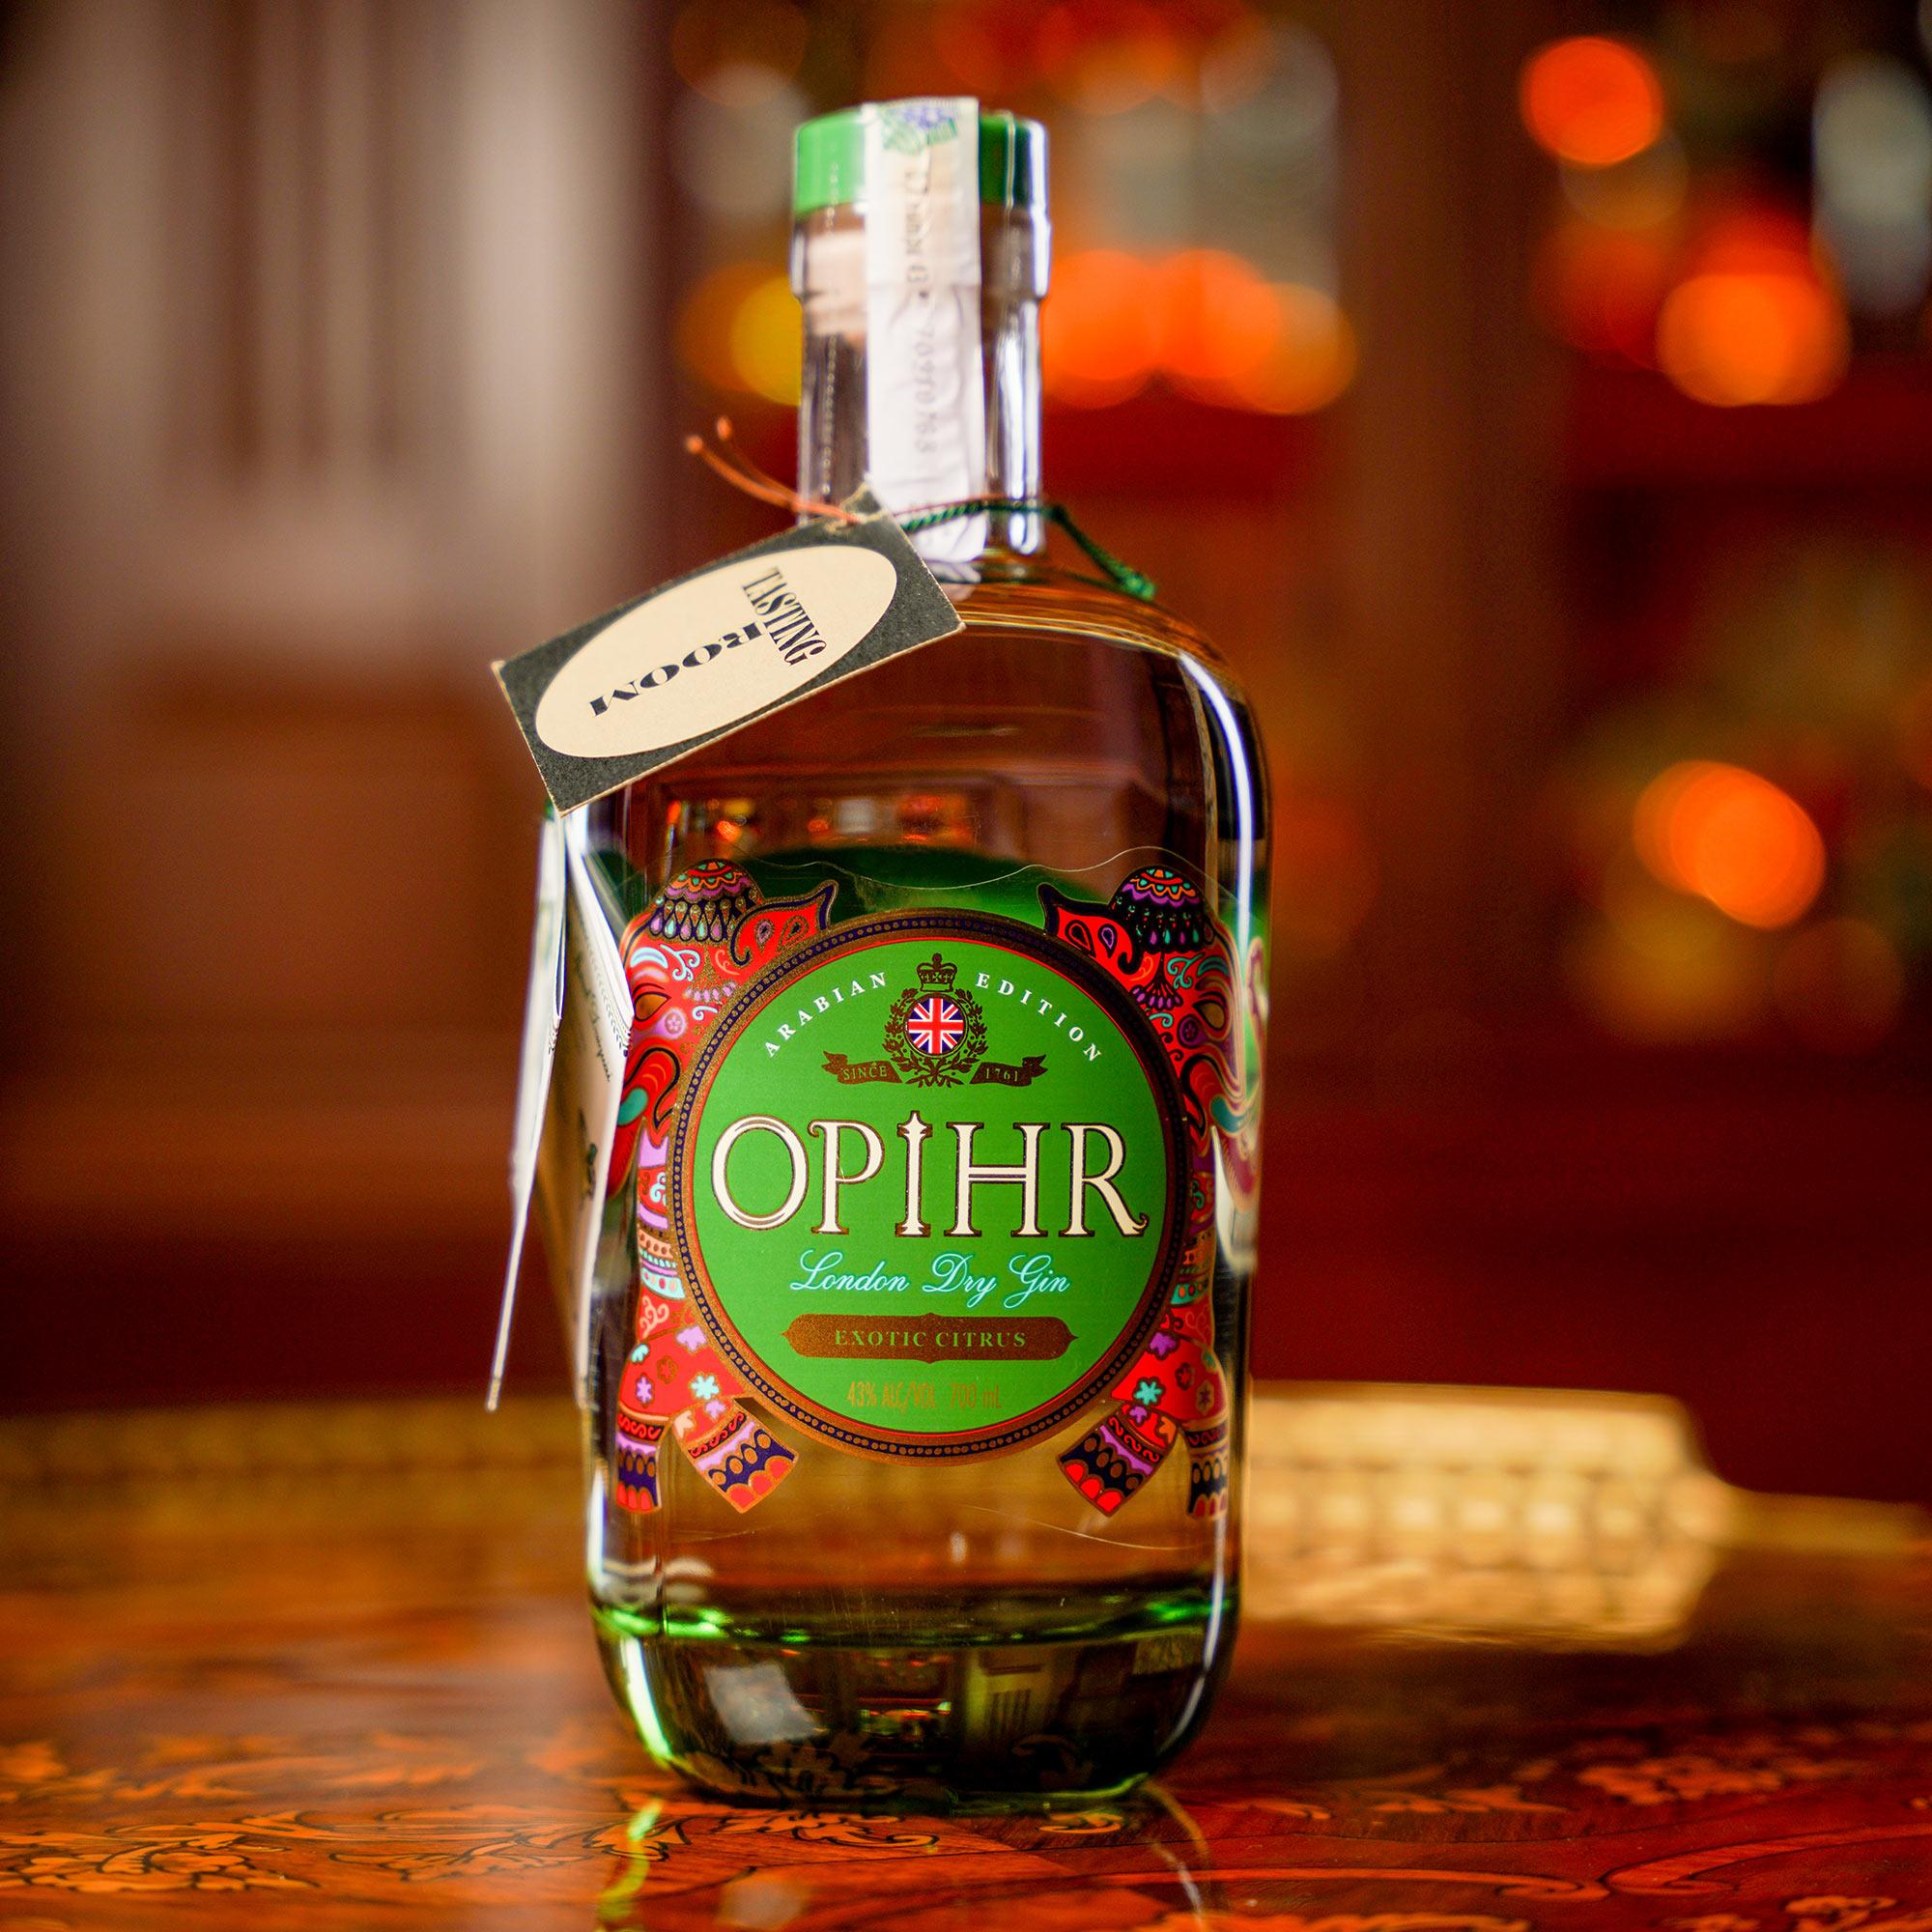 Opihr Arabian Edition Exotic Citrus Gin /Опир Екзотик Цитрус Арабско издание Джин